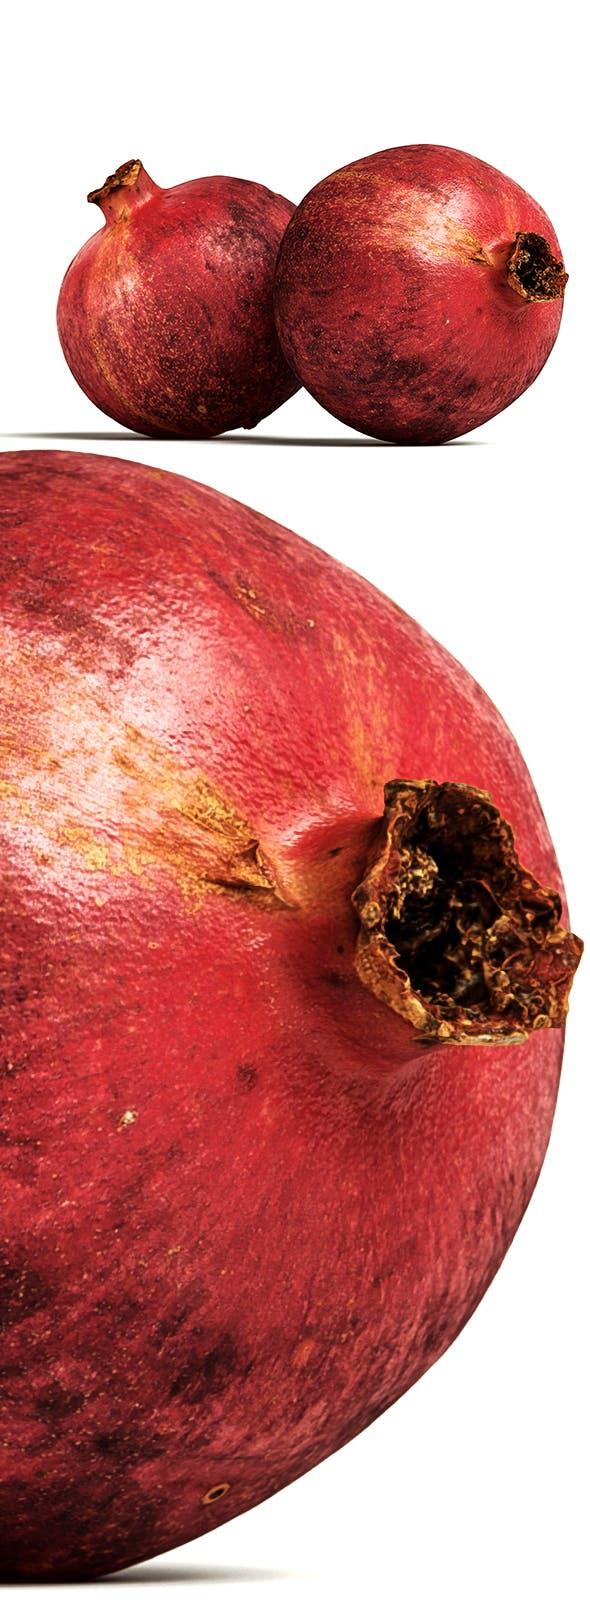 Pomegranate 001 - 3DOcean Item for Sale